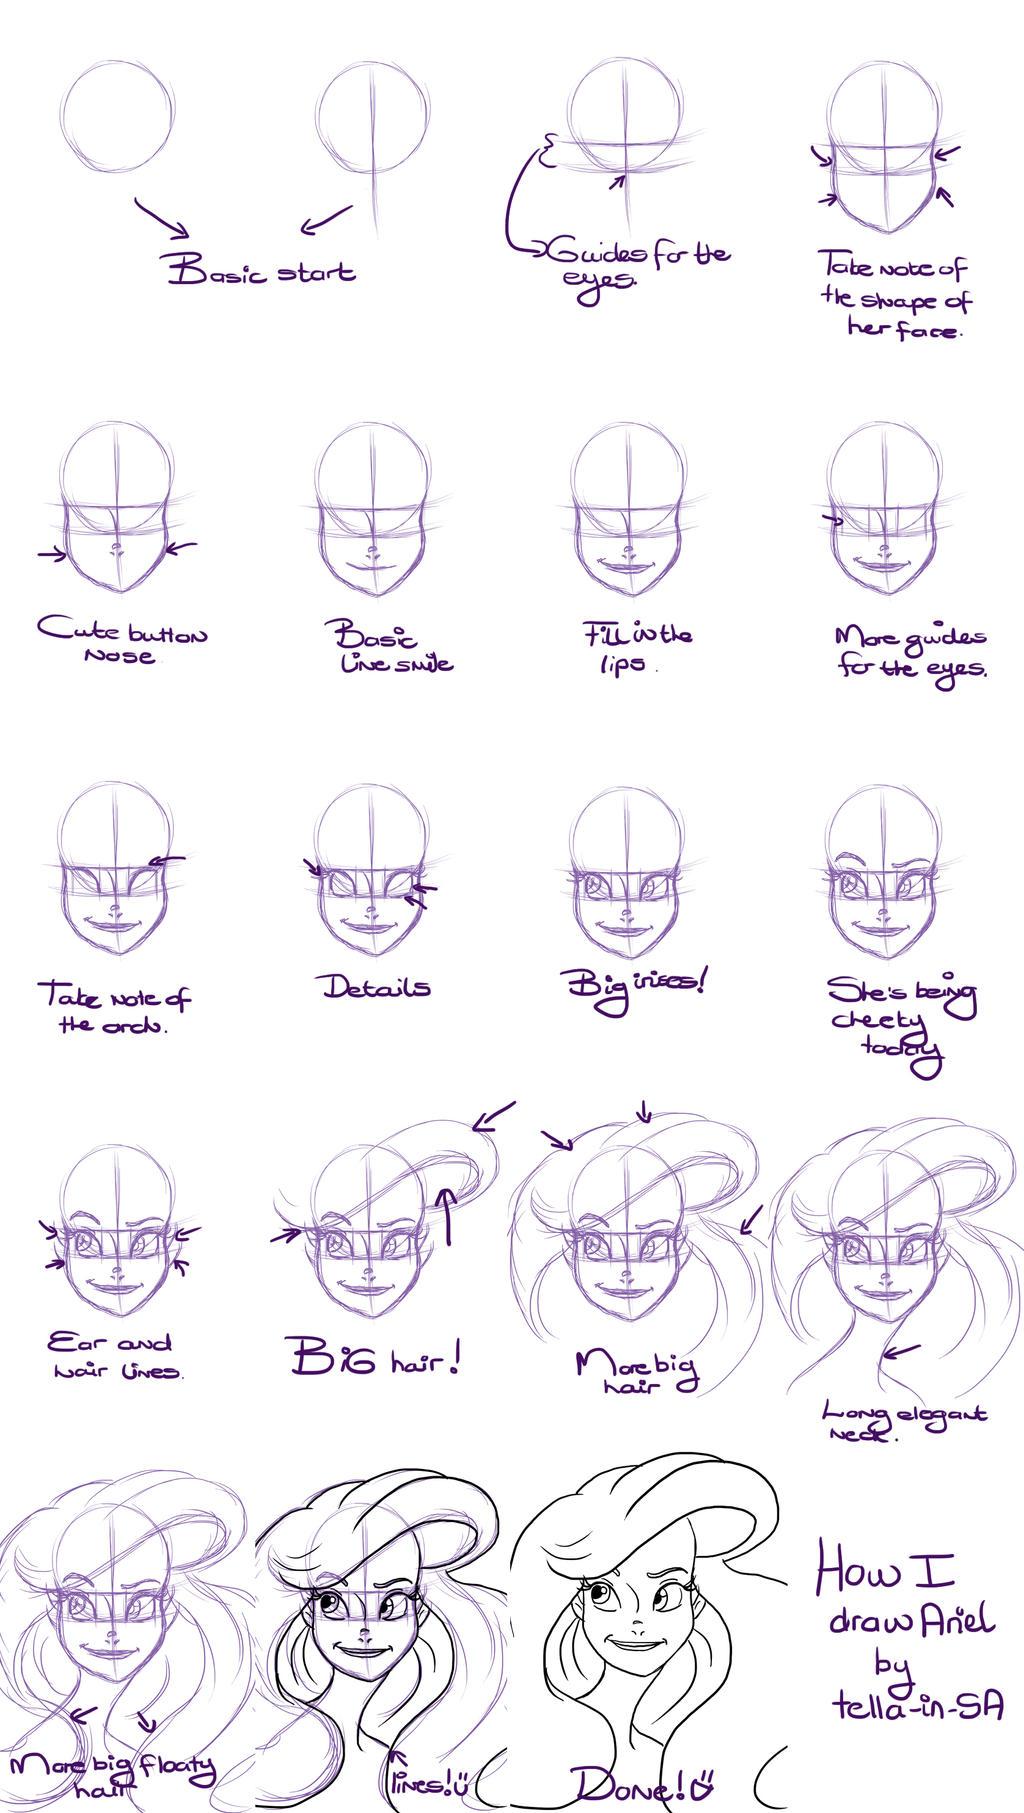 How I draw Ariel by Tella-in-SA